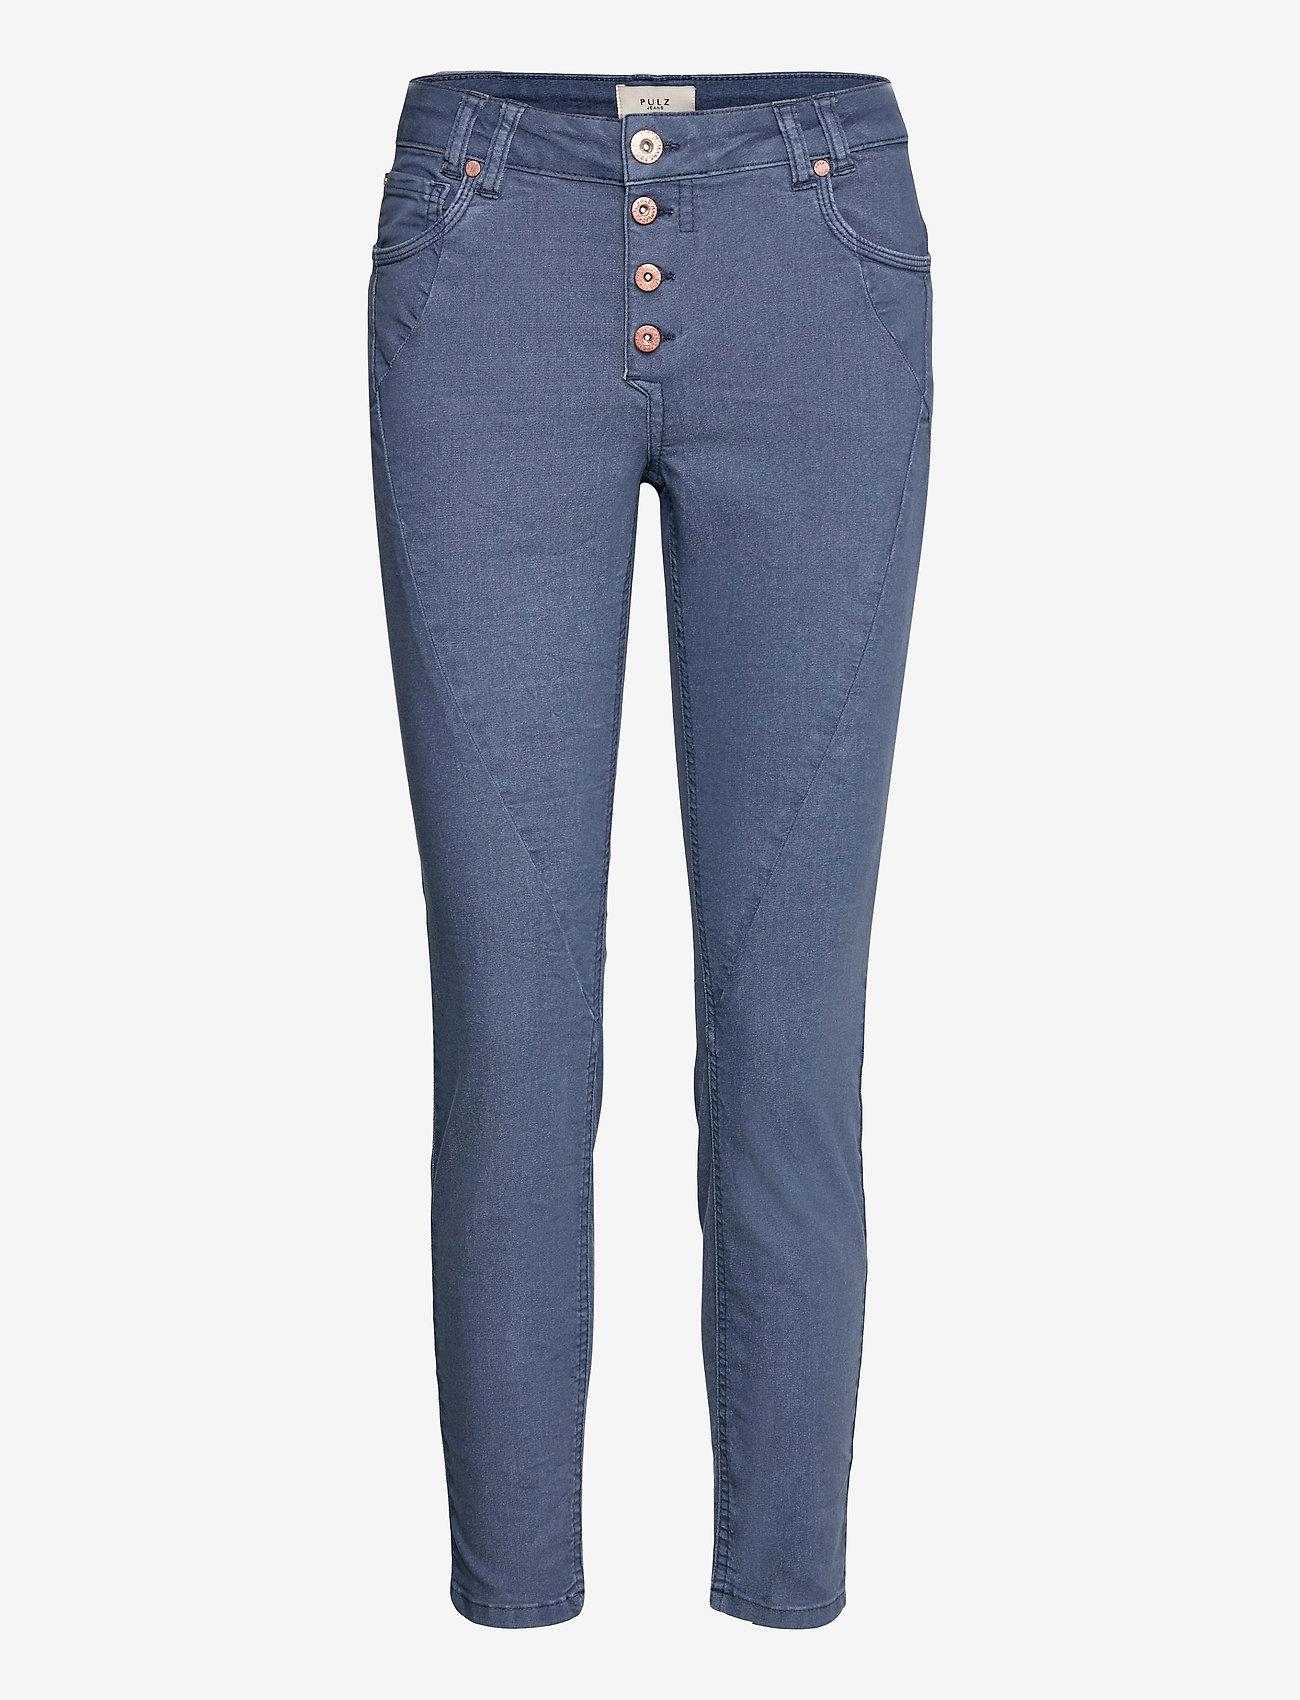 Pulz Jeans - PZROSITA PANT - skinny jeans - vintage indigo - 0